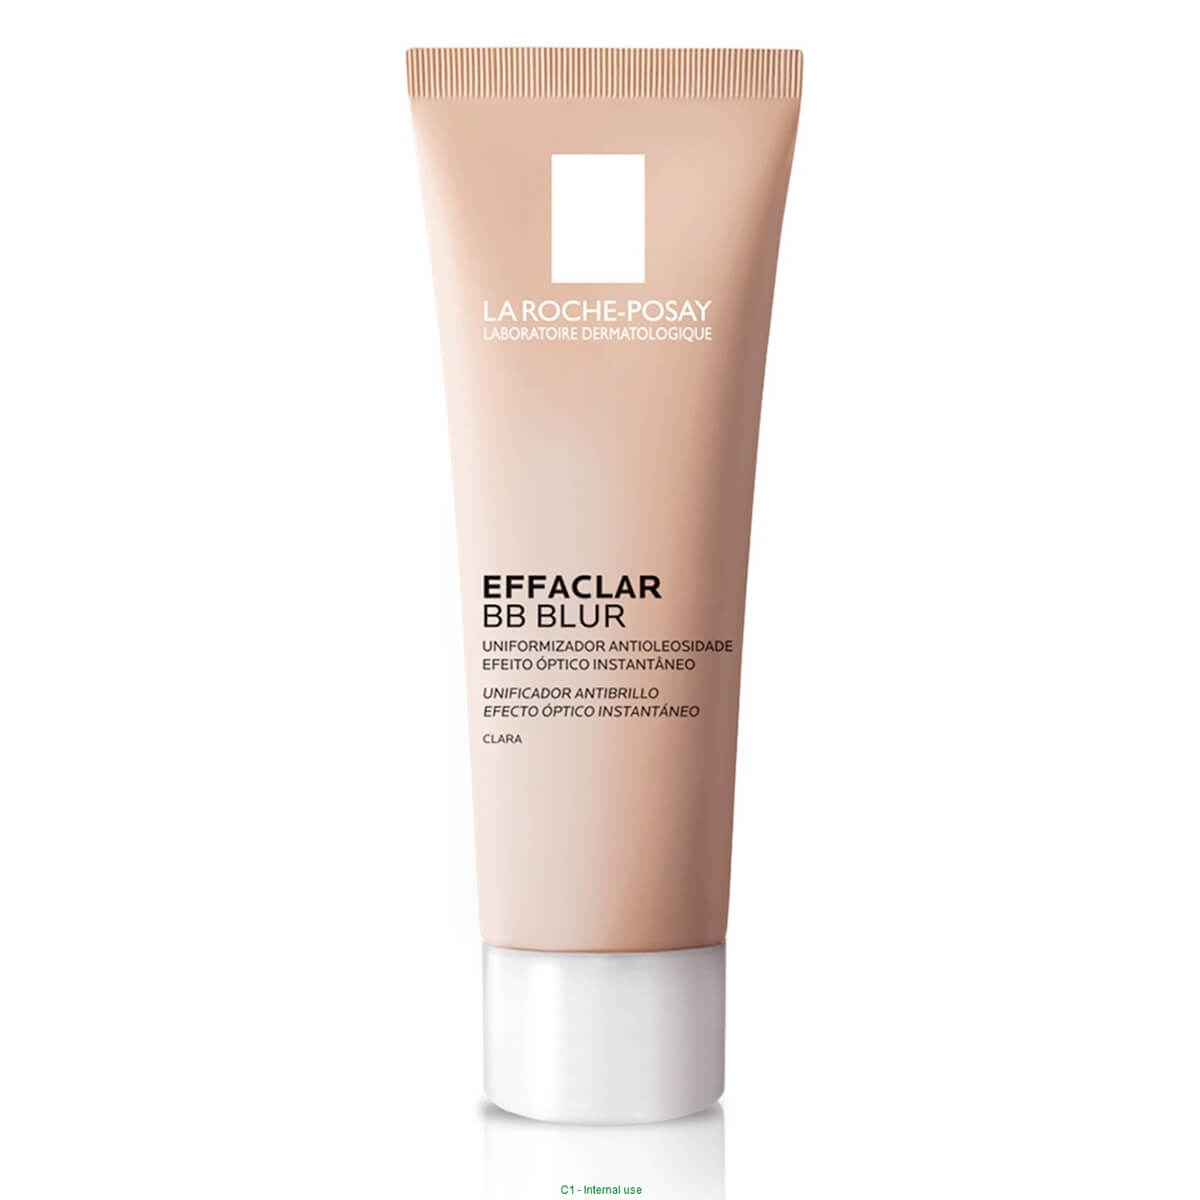 Uniformizador Facial La Roche-Posay Effaclar BB Blur Clara Antioleosidade com 20ml 20ml